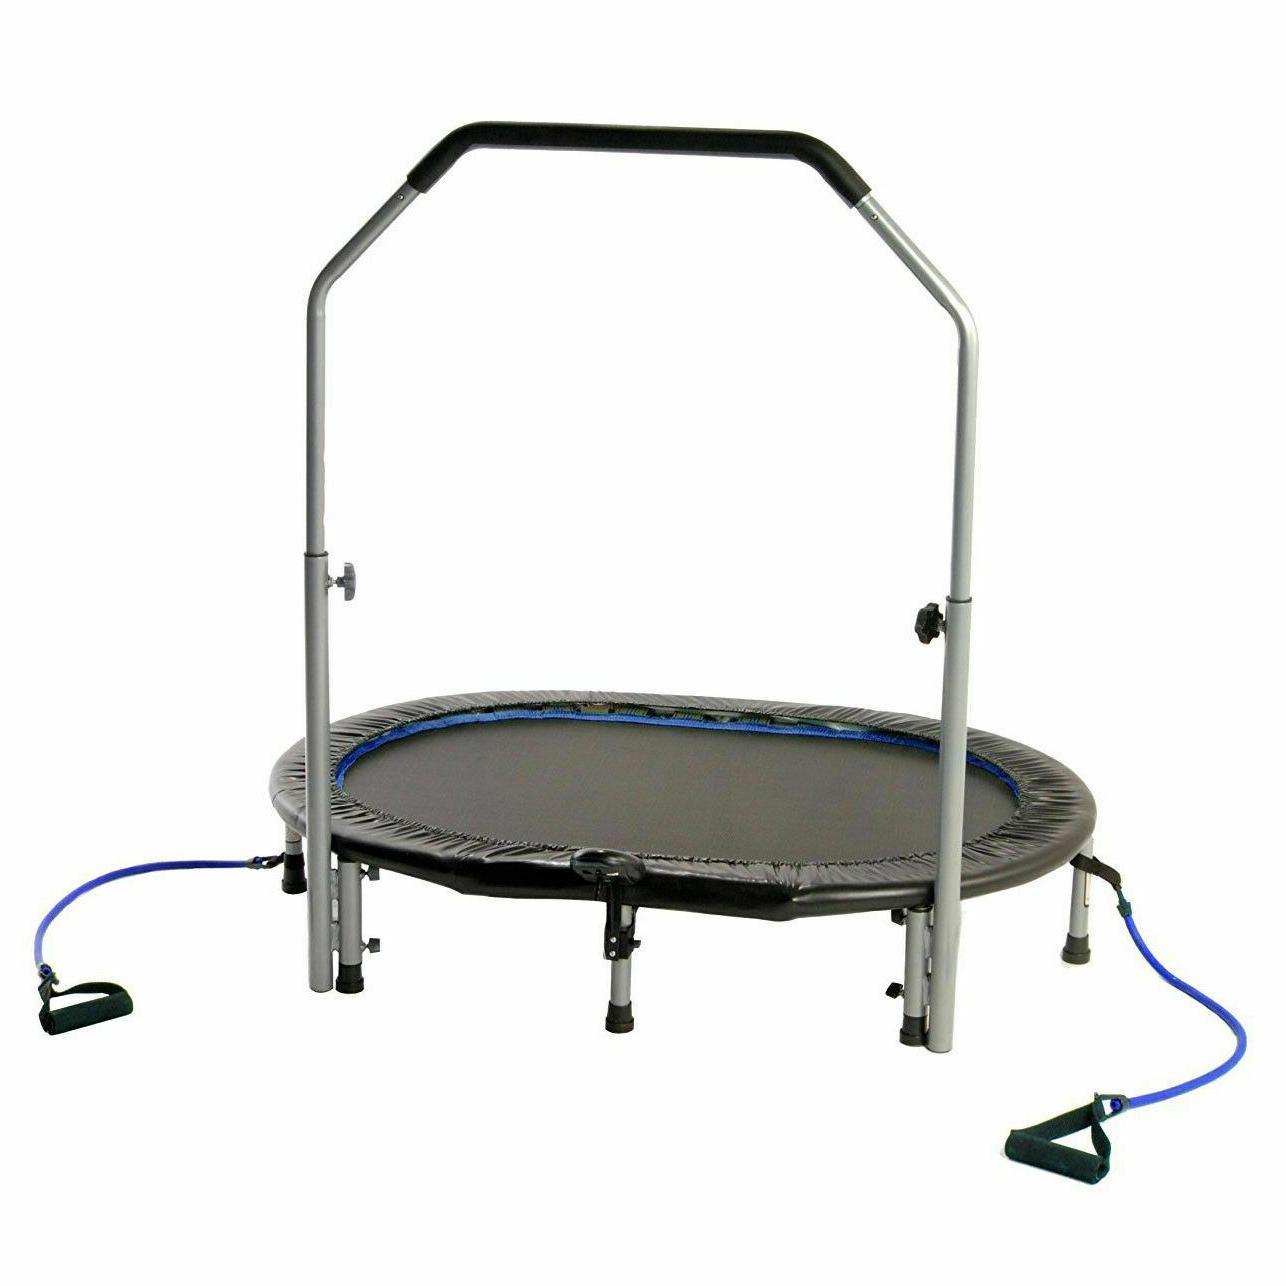 Stamina 55-Inch Trampoline Intone Oval Bouncer Handlebar